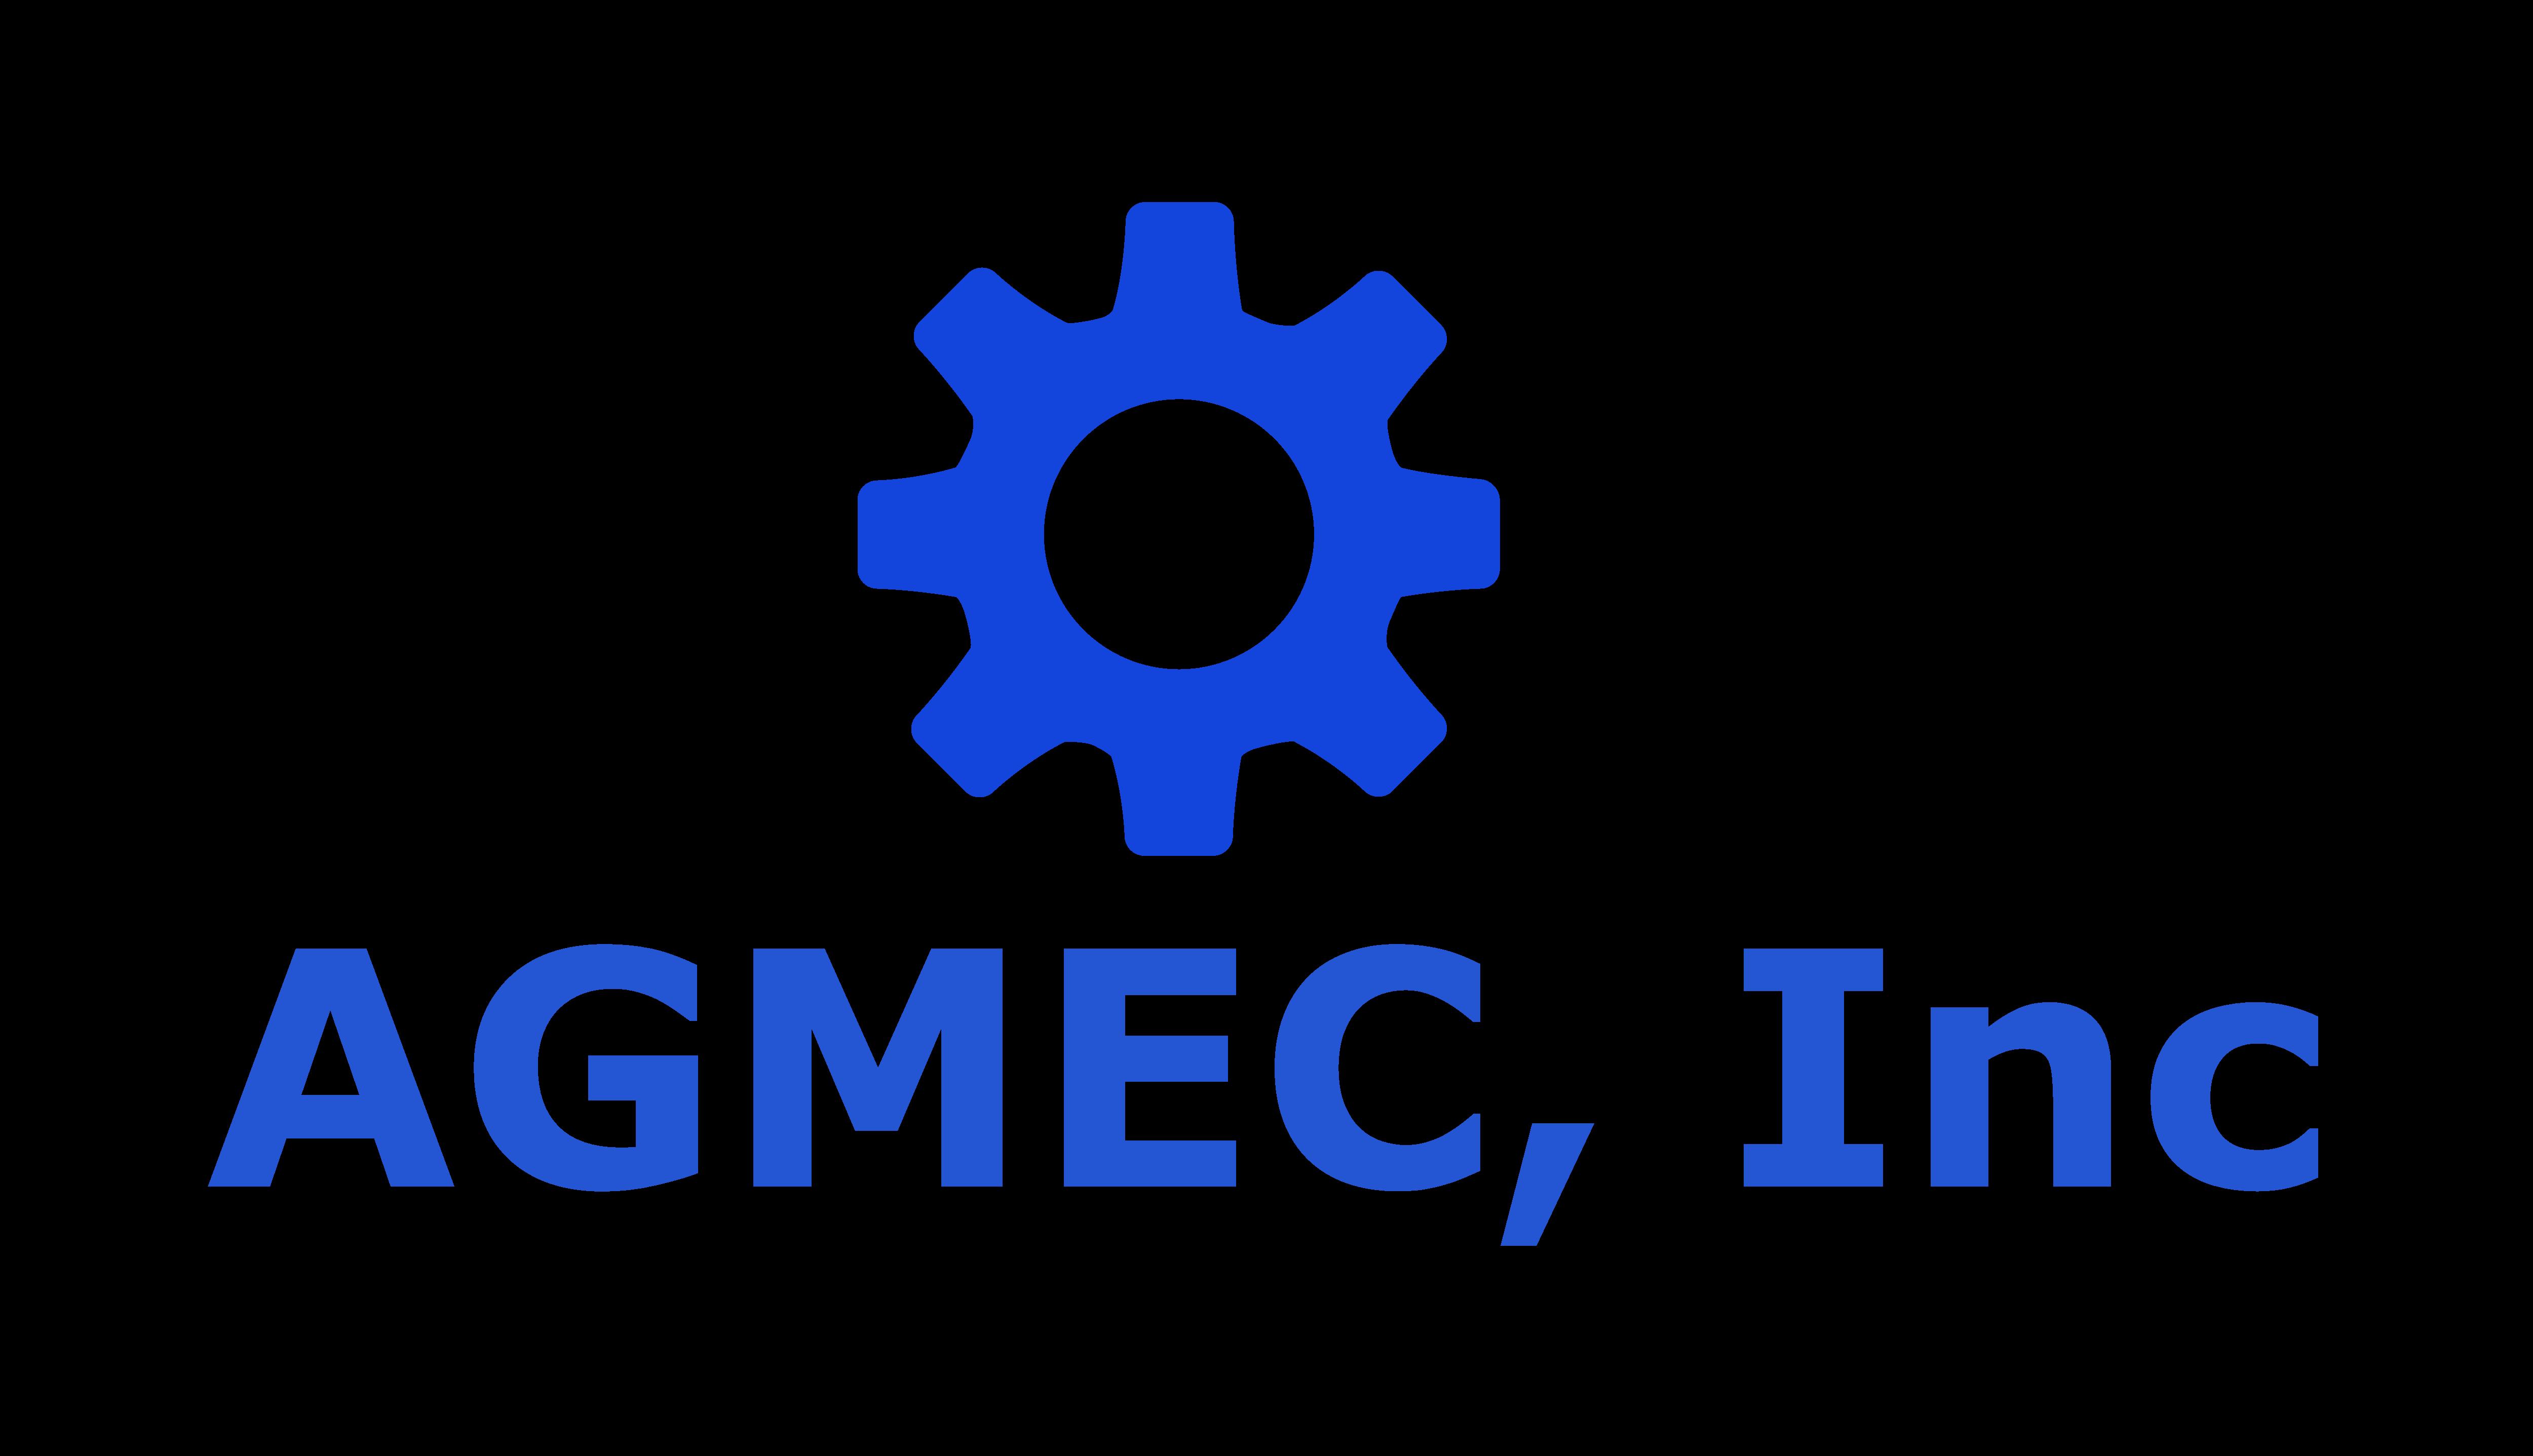 Agmec